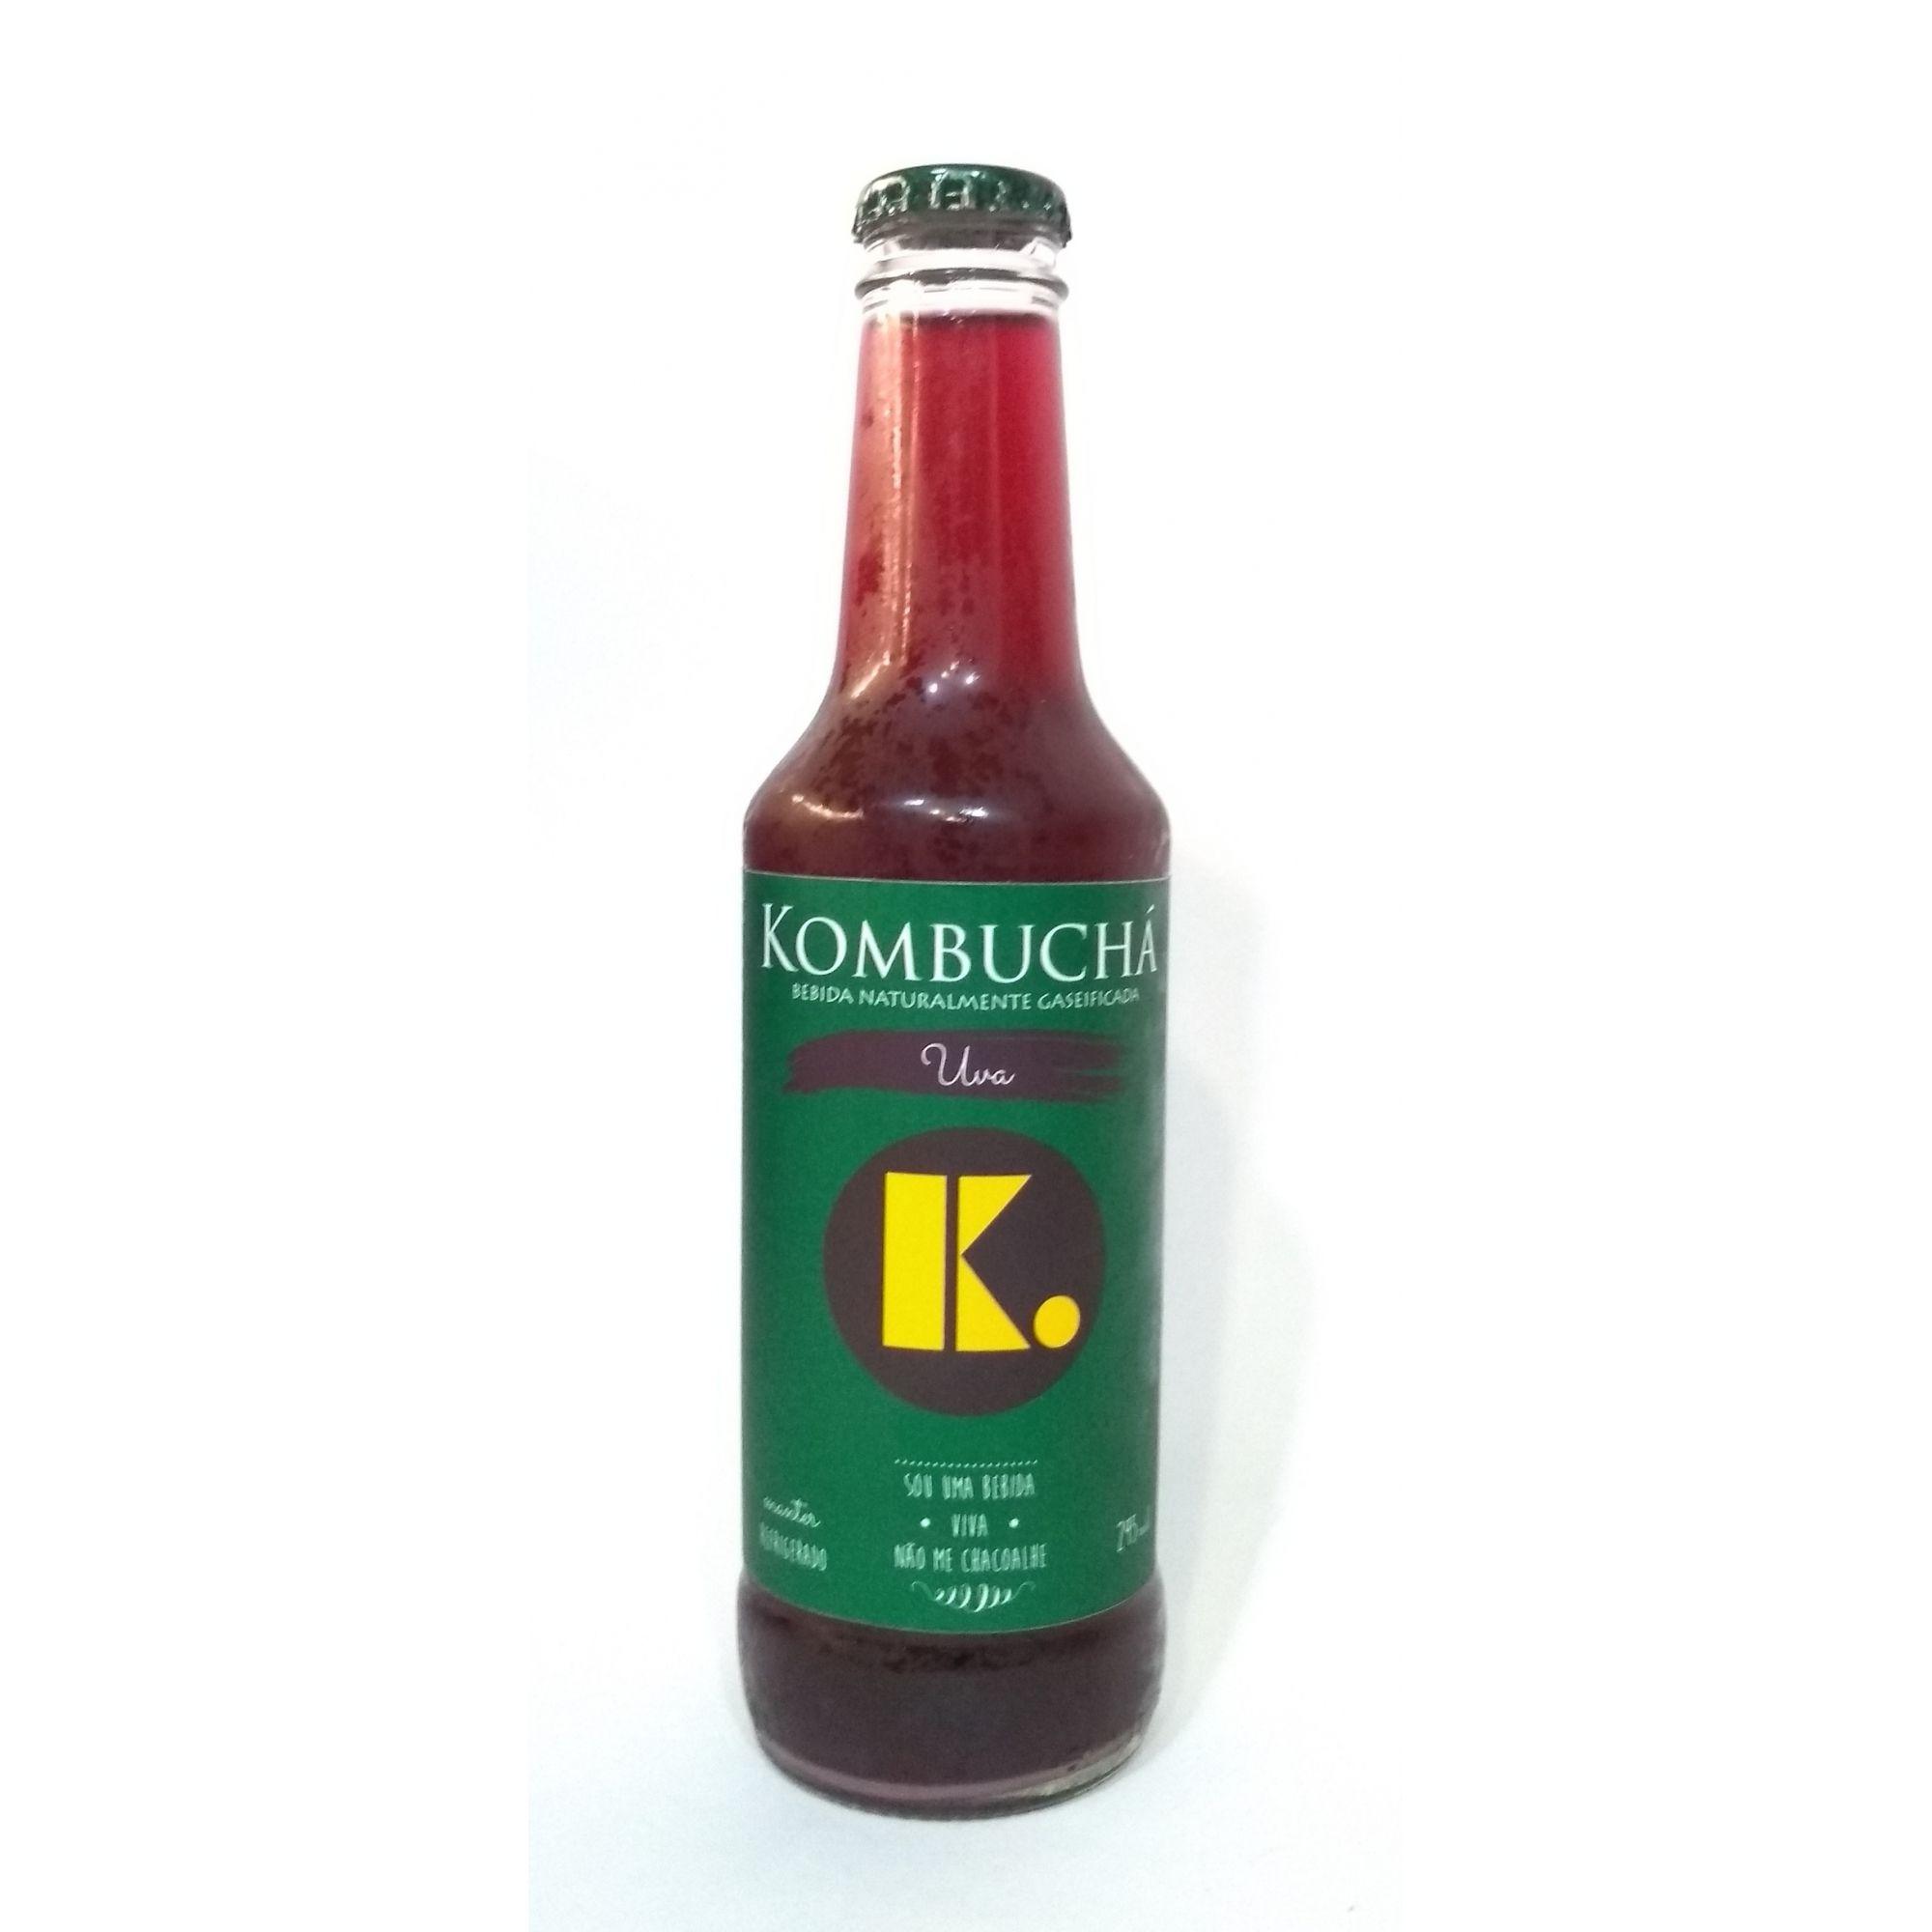 Kombuchá, 295ml – K Probióticos